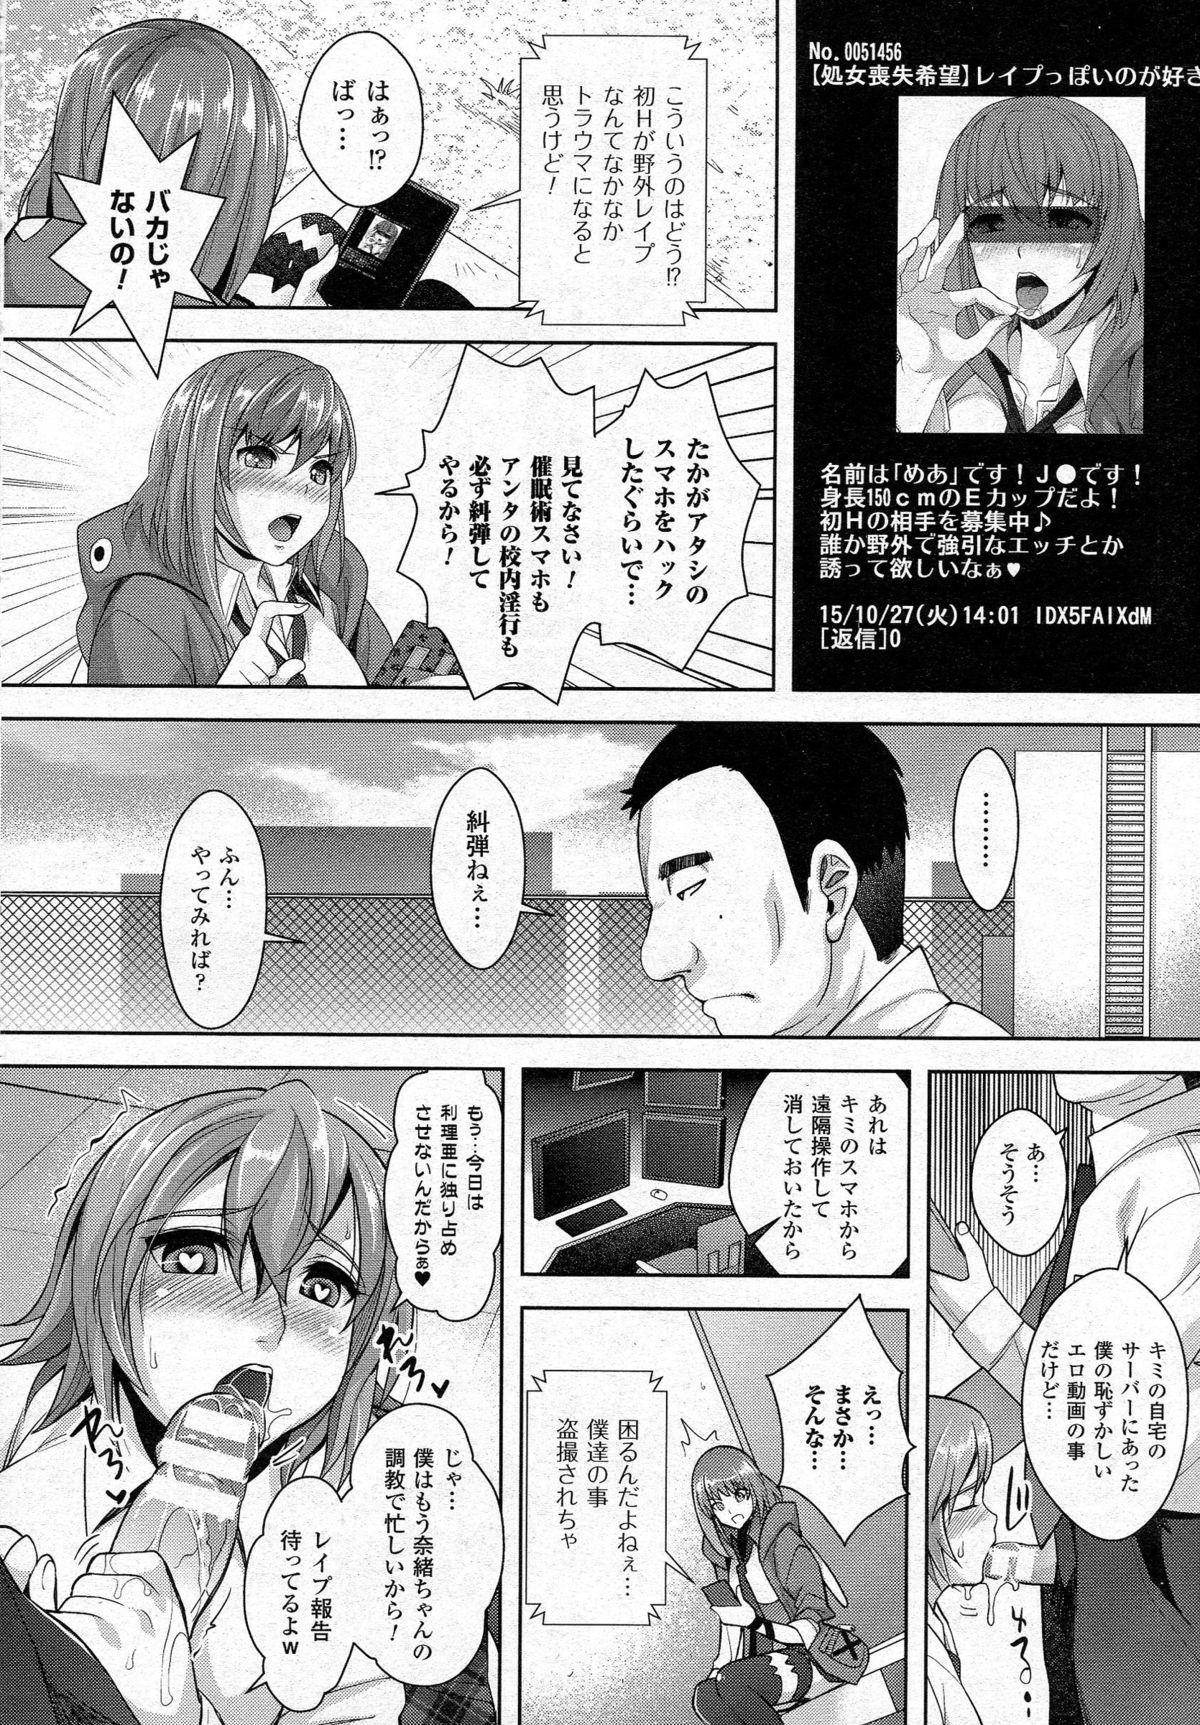 COMIC Unreal 2015-06 Vol. 55 + Hisasi Illust Shuu 252